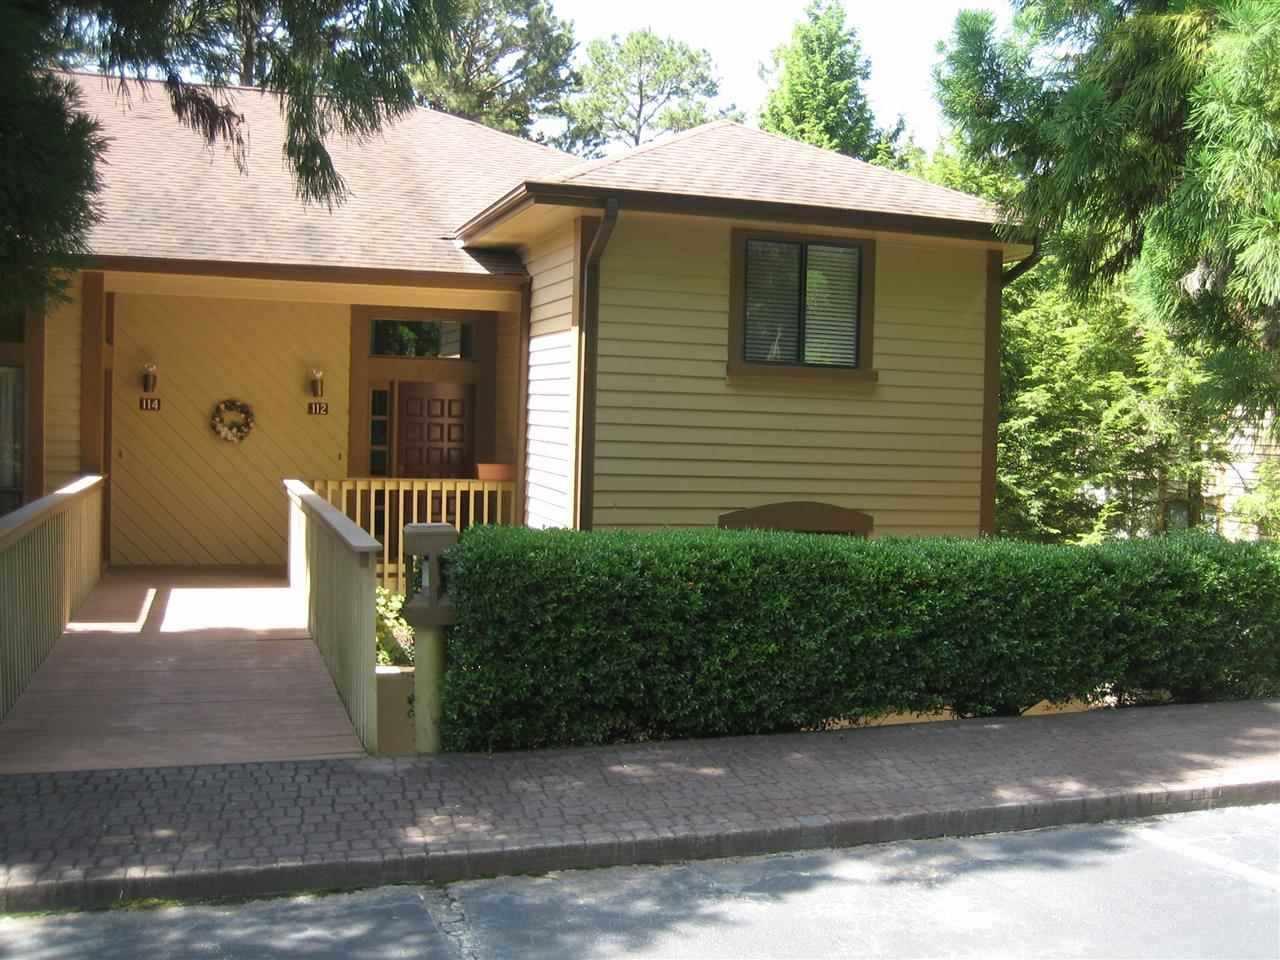 112 E Blue Heron Drive, Salem, SC 29676 (MLS #20167026) :: Les Walden Real Estate